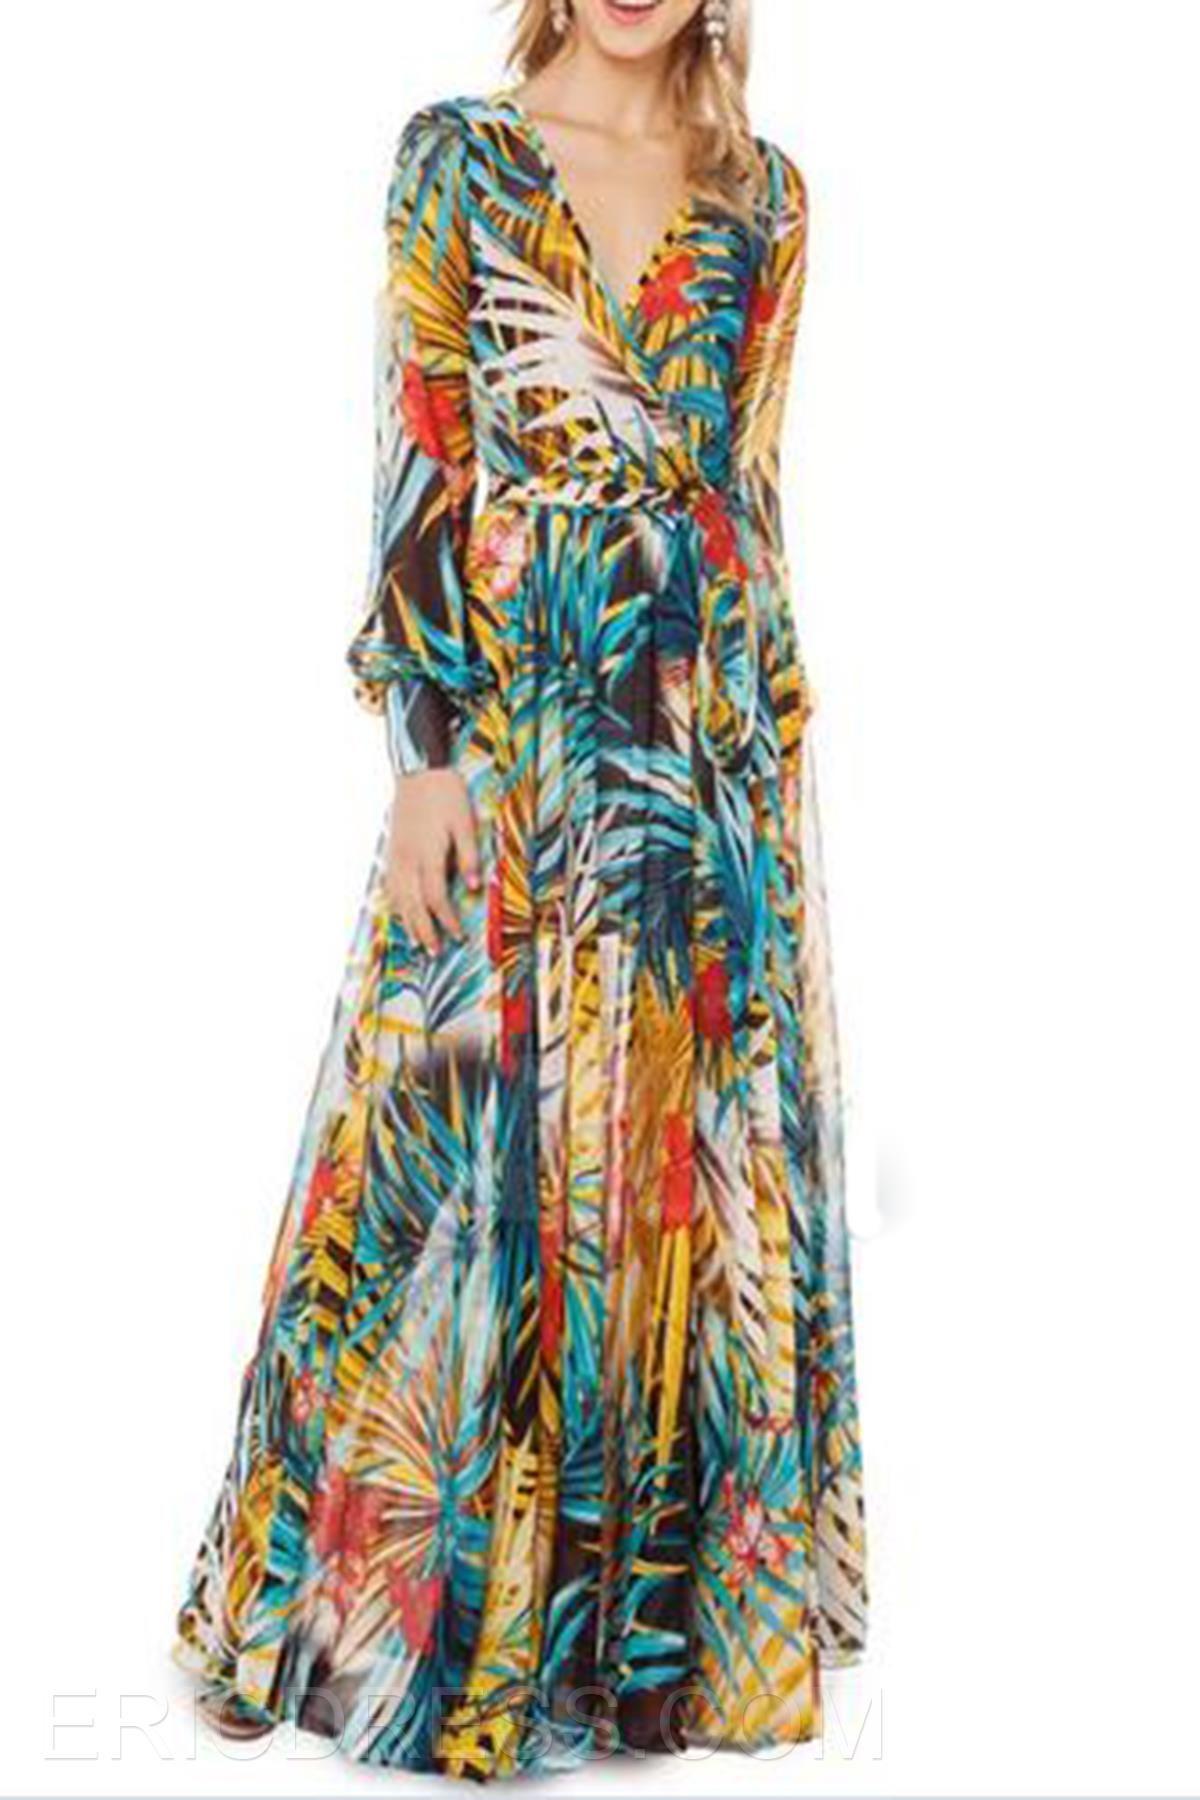 d86d9c69756a Beautiful V-Neck Long Sleeve Floral Print Allover Maxi Dress Maximum Style-  ericdress.com 10967635